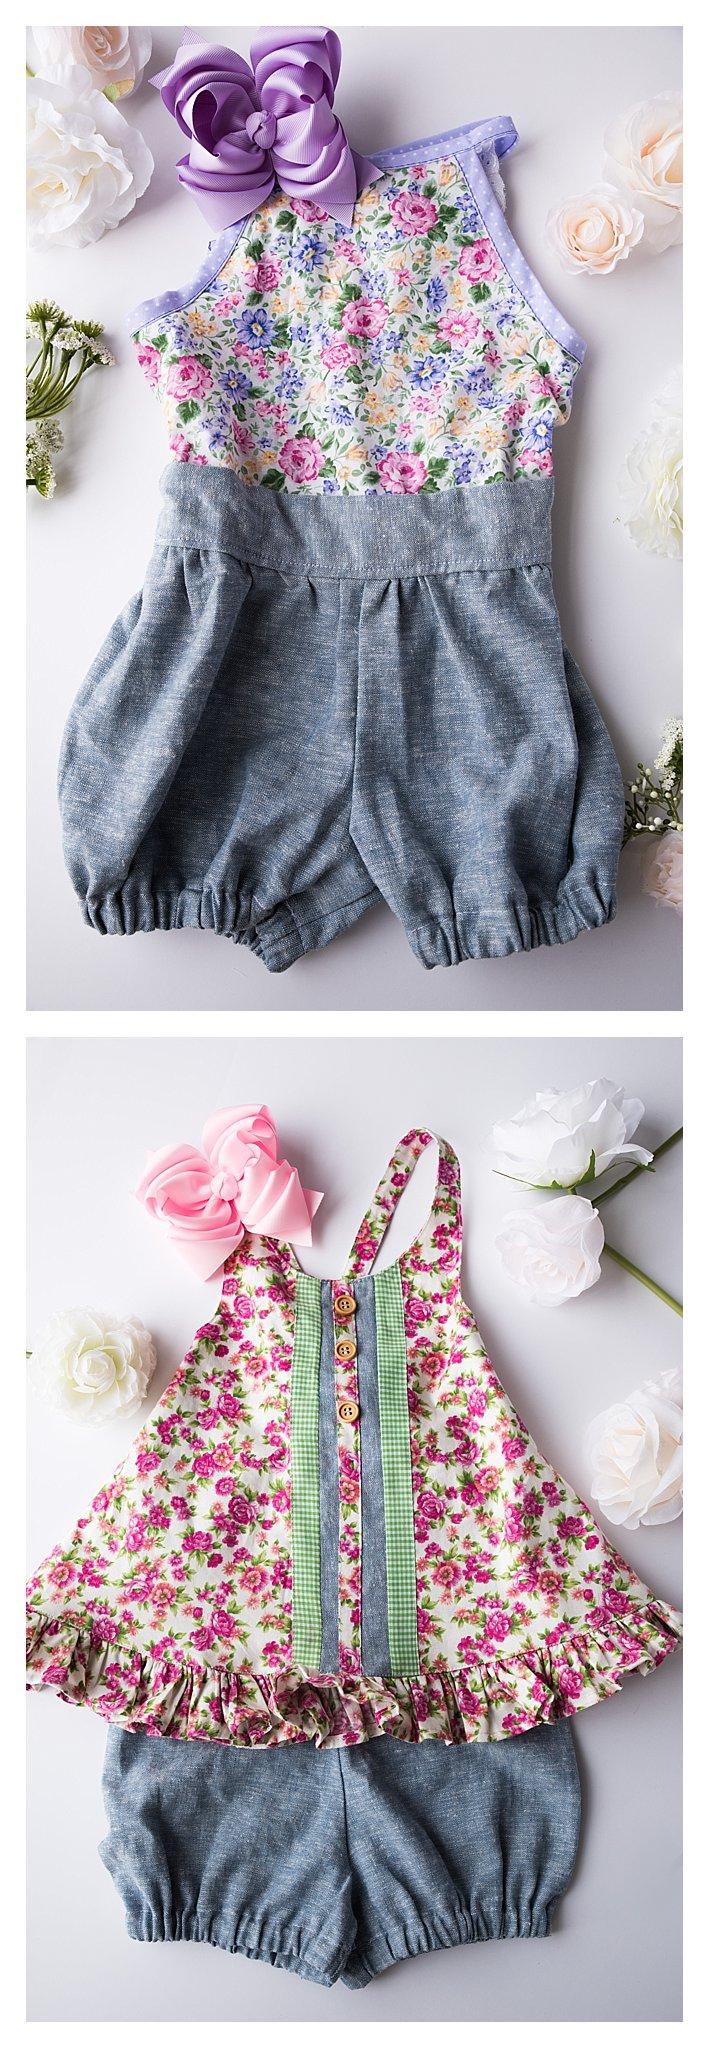 purple romper for toddler girls, vintage top for girls